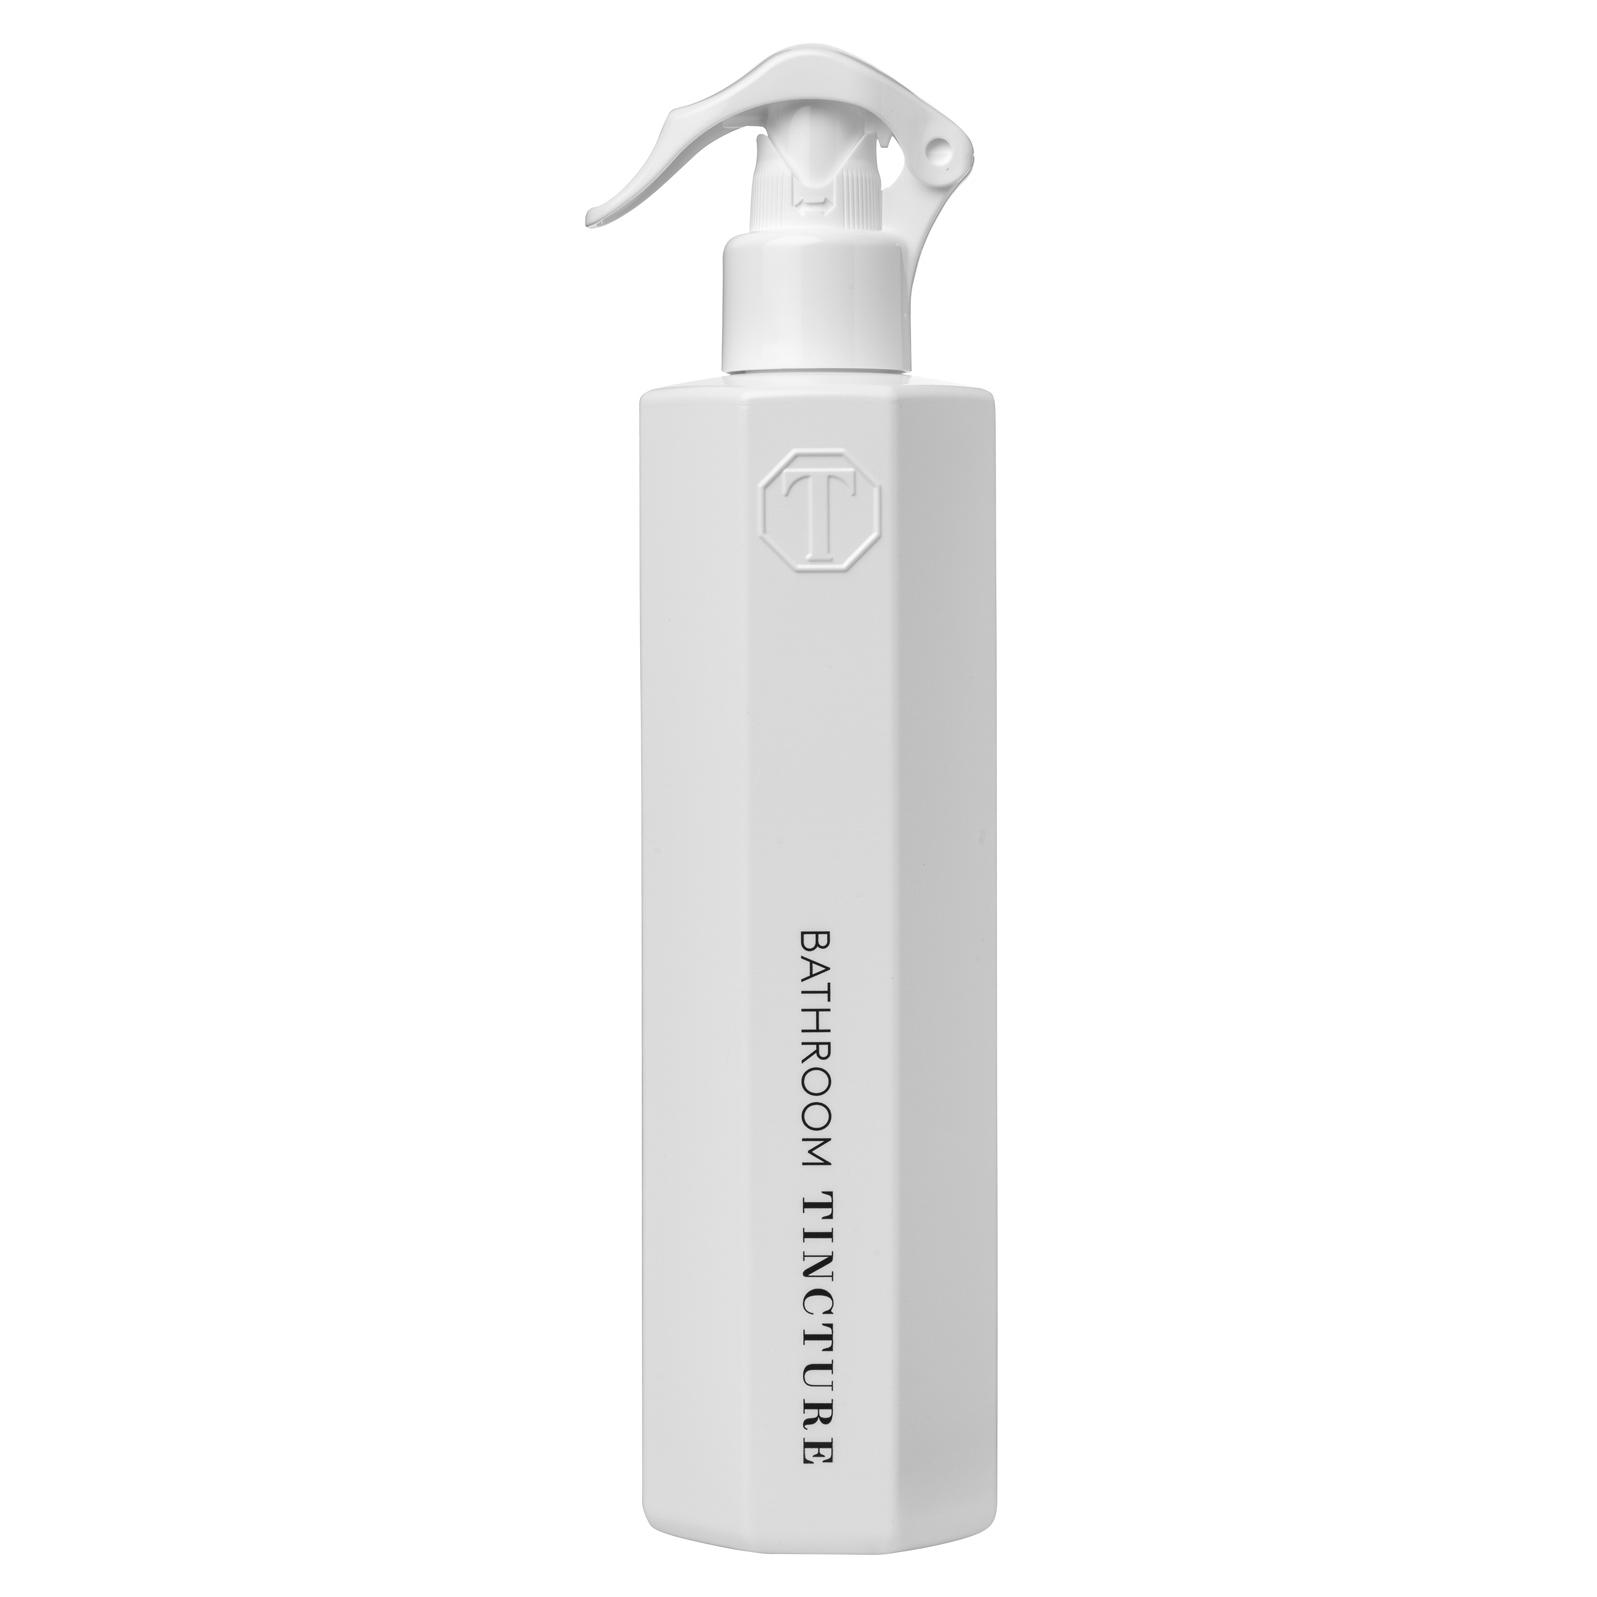 Refillable Bathroom Cleaning Spray Eco Friendly